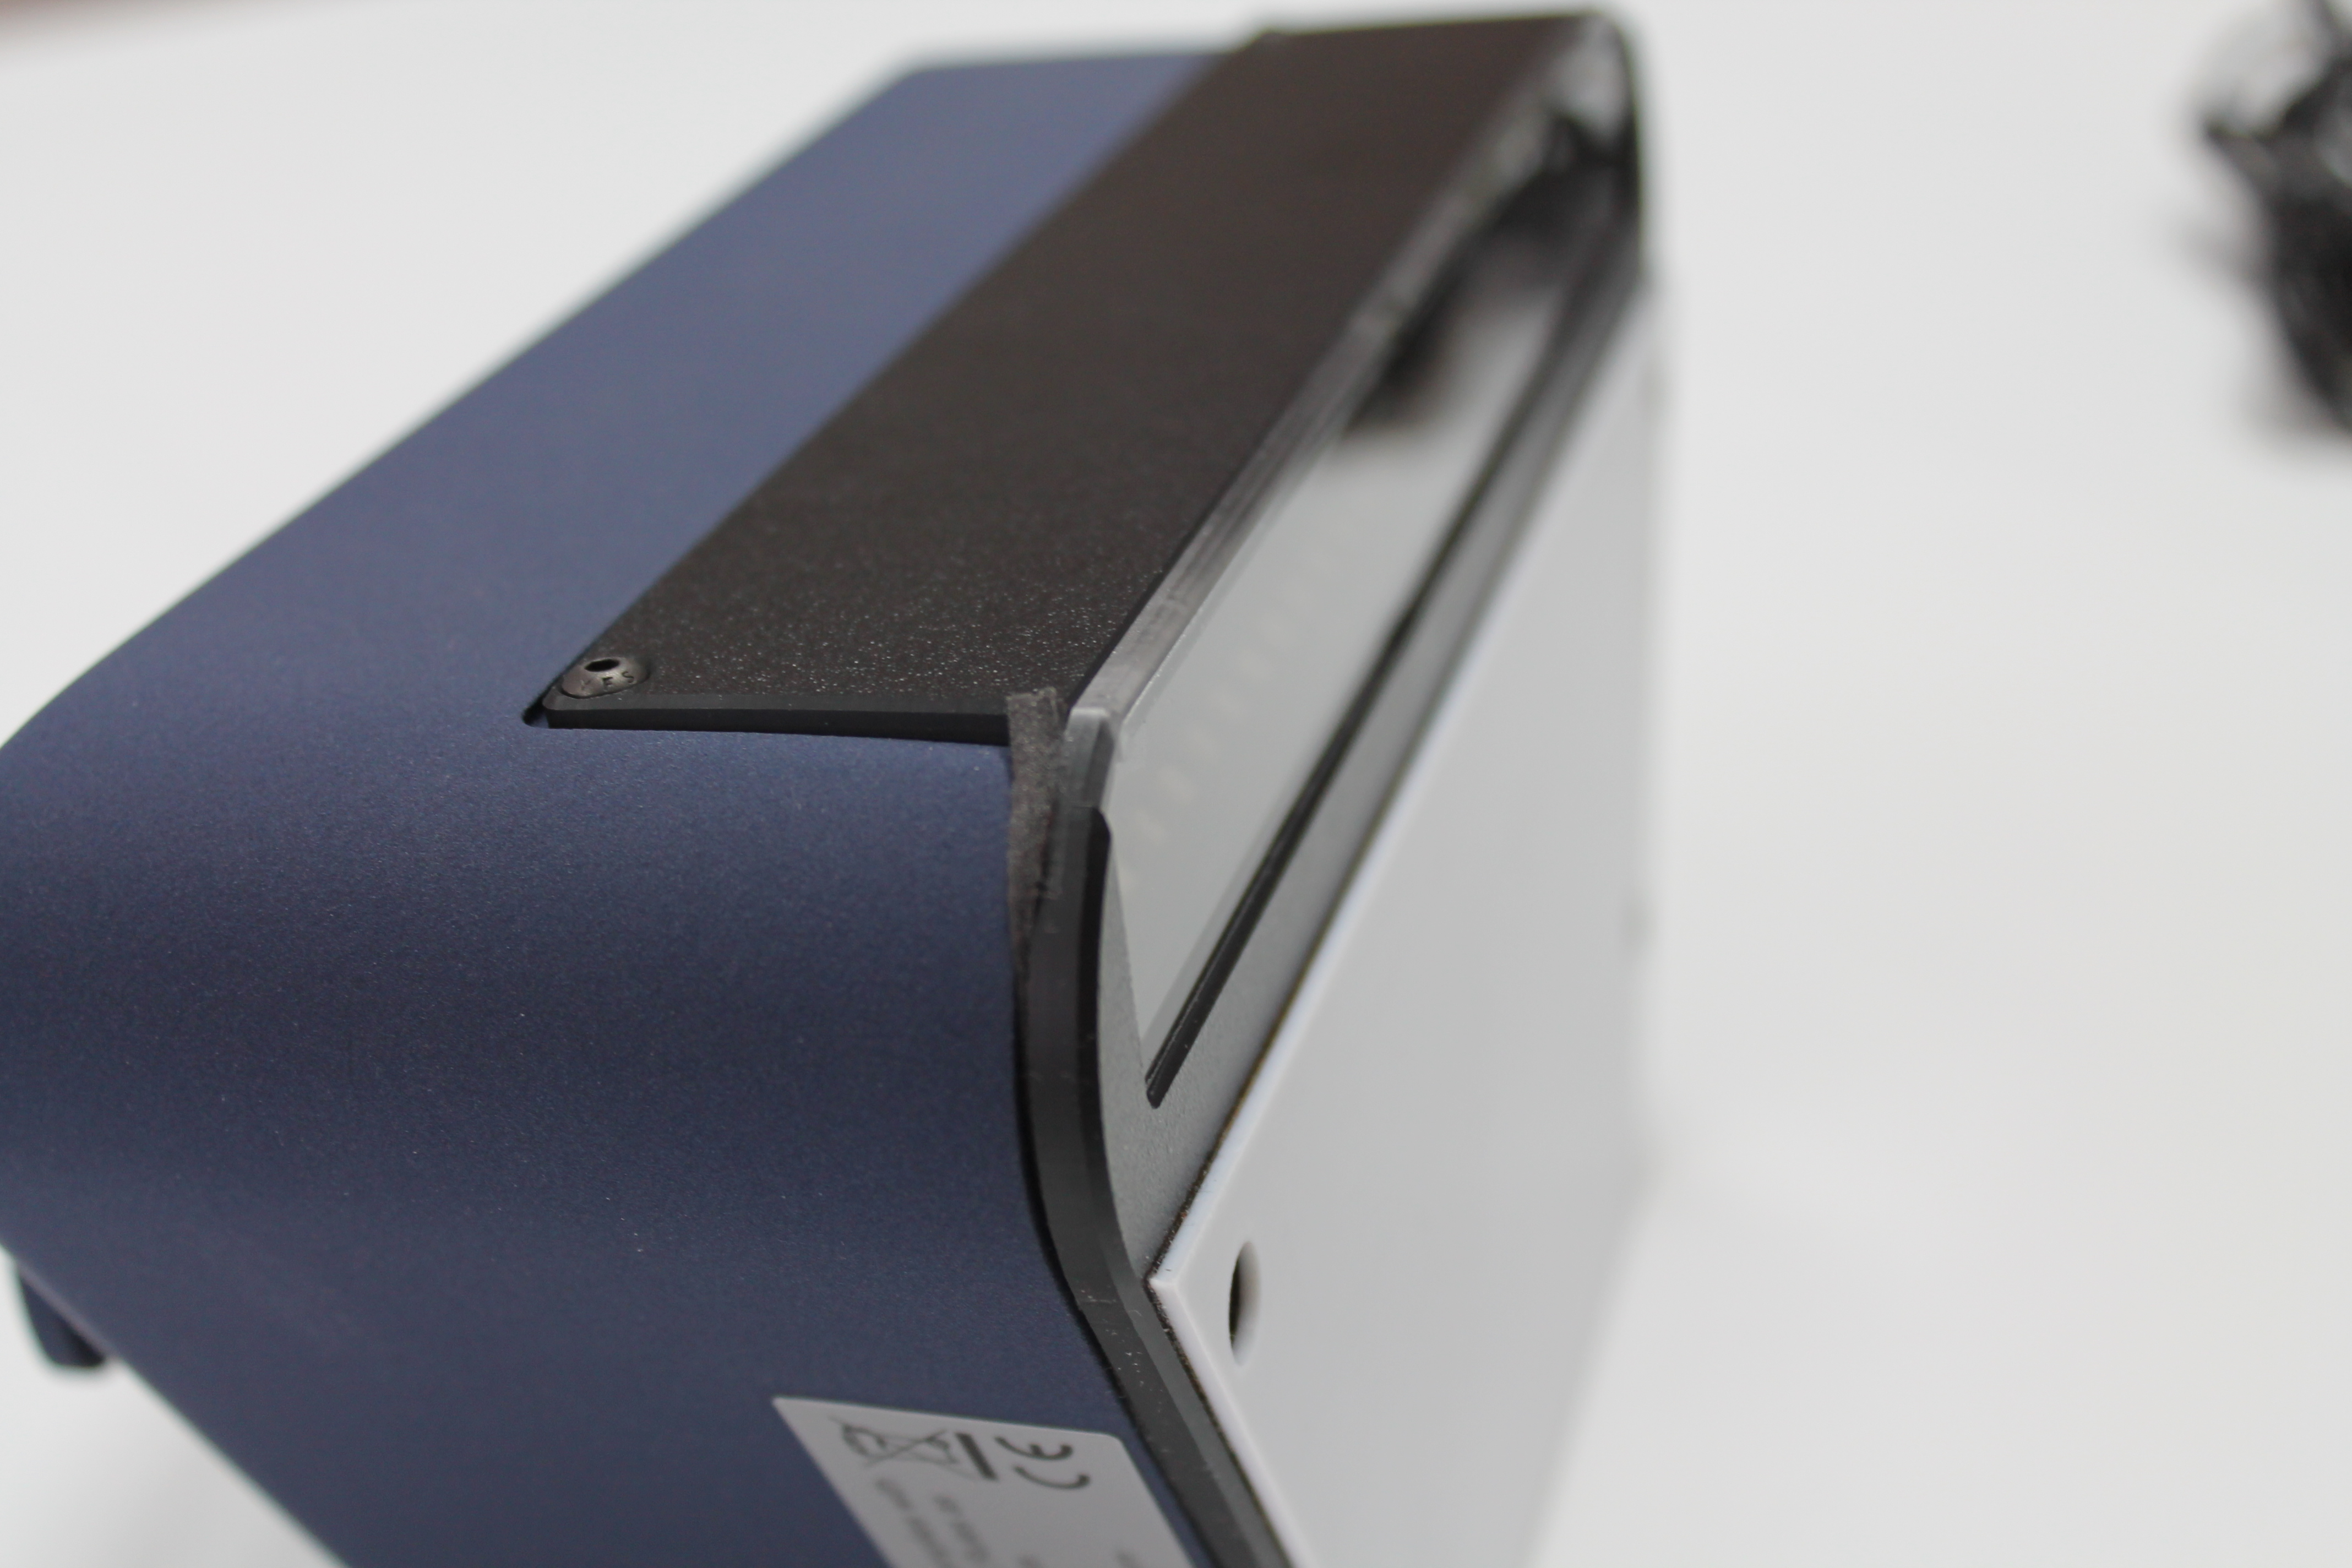 Barcode verifier accessories | Axicon accessories